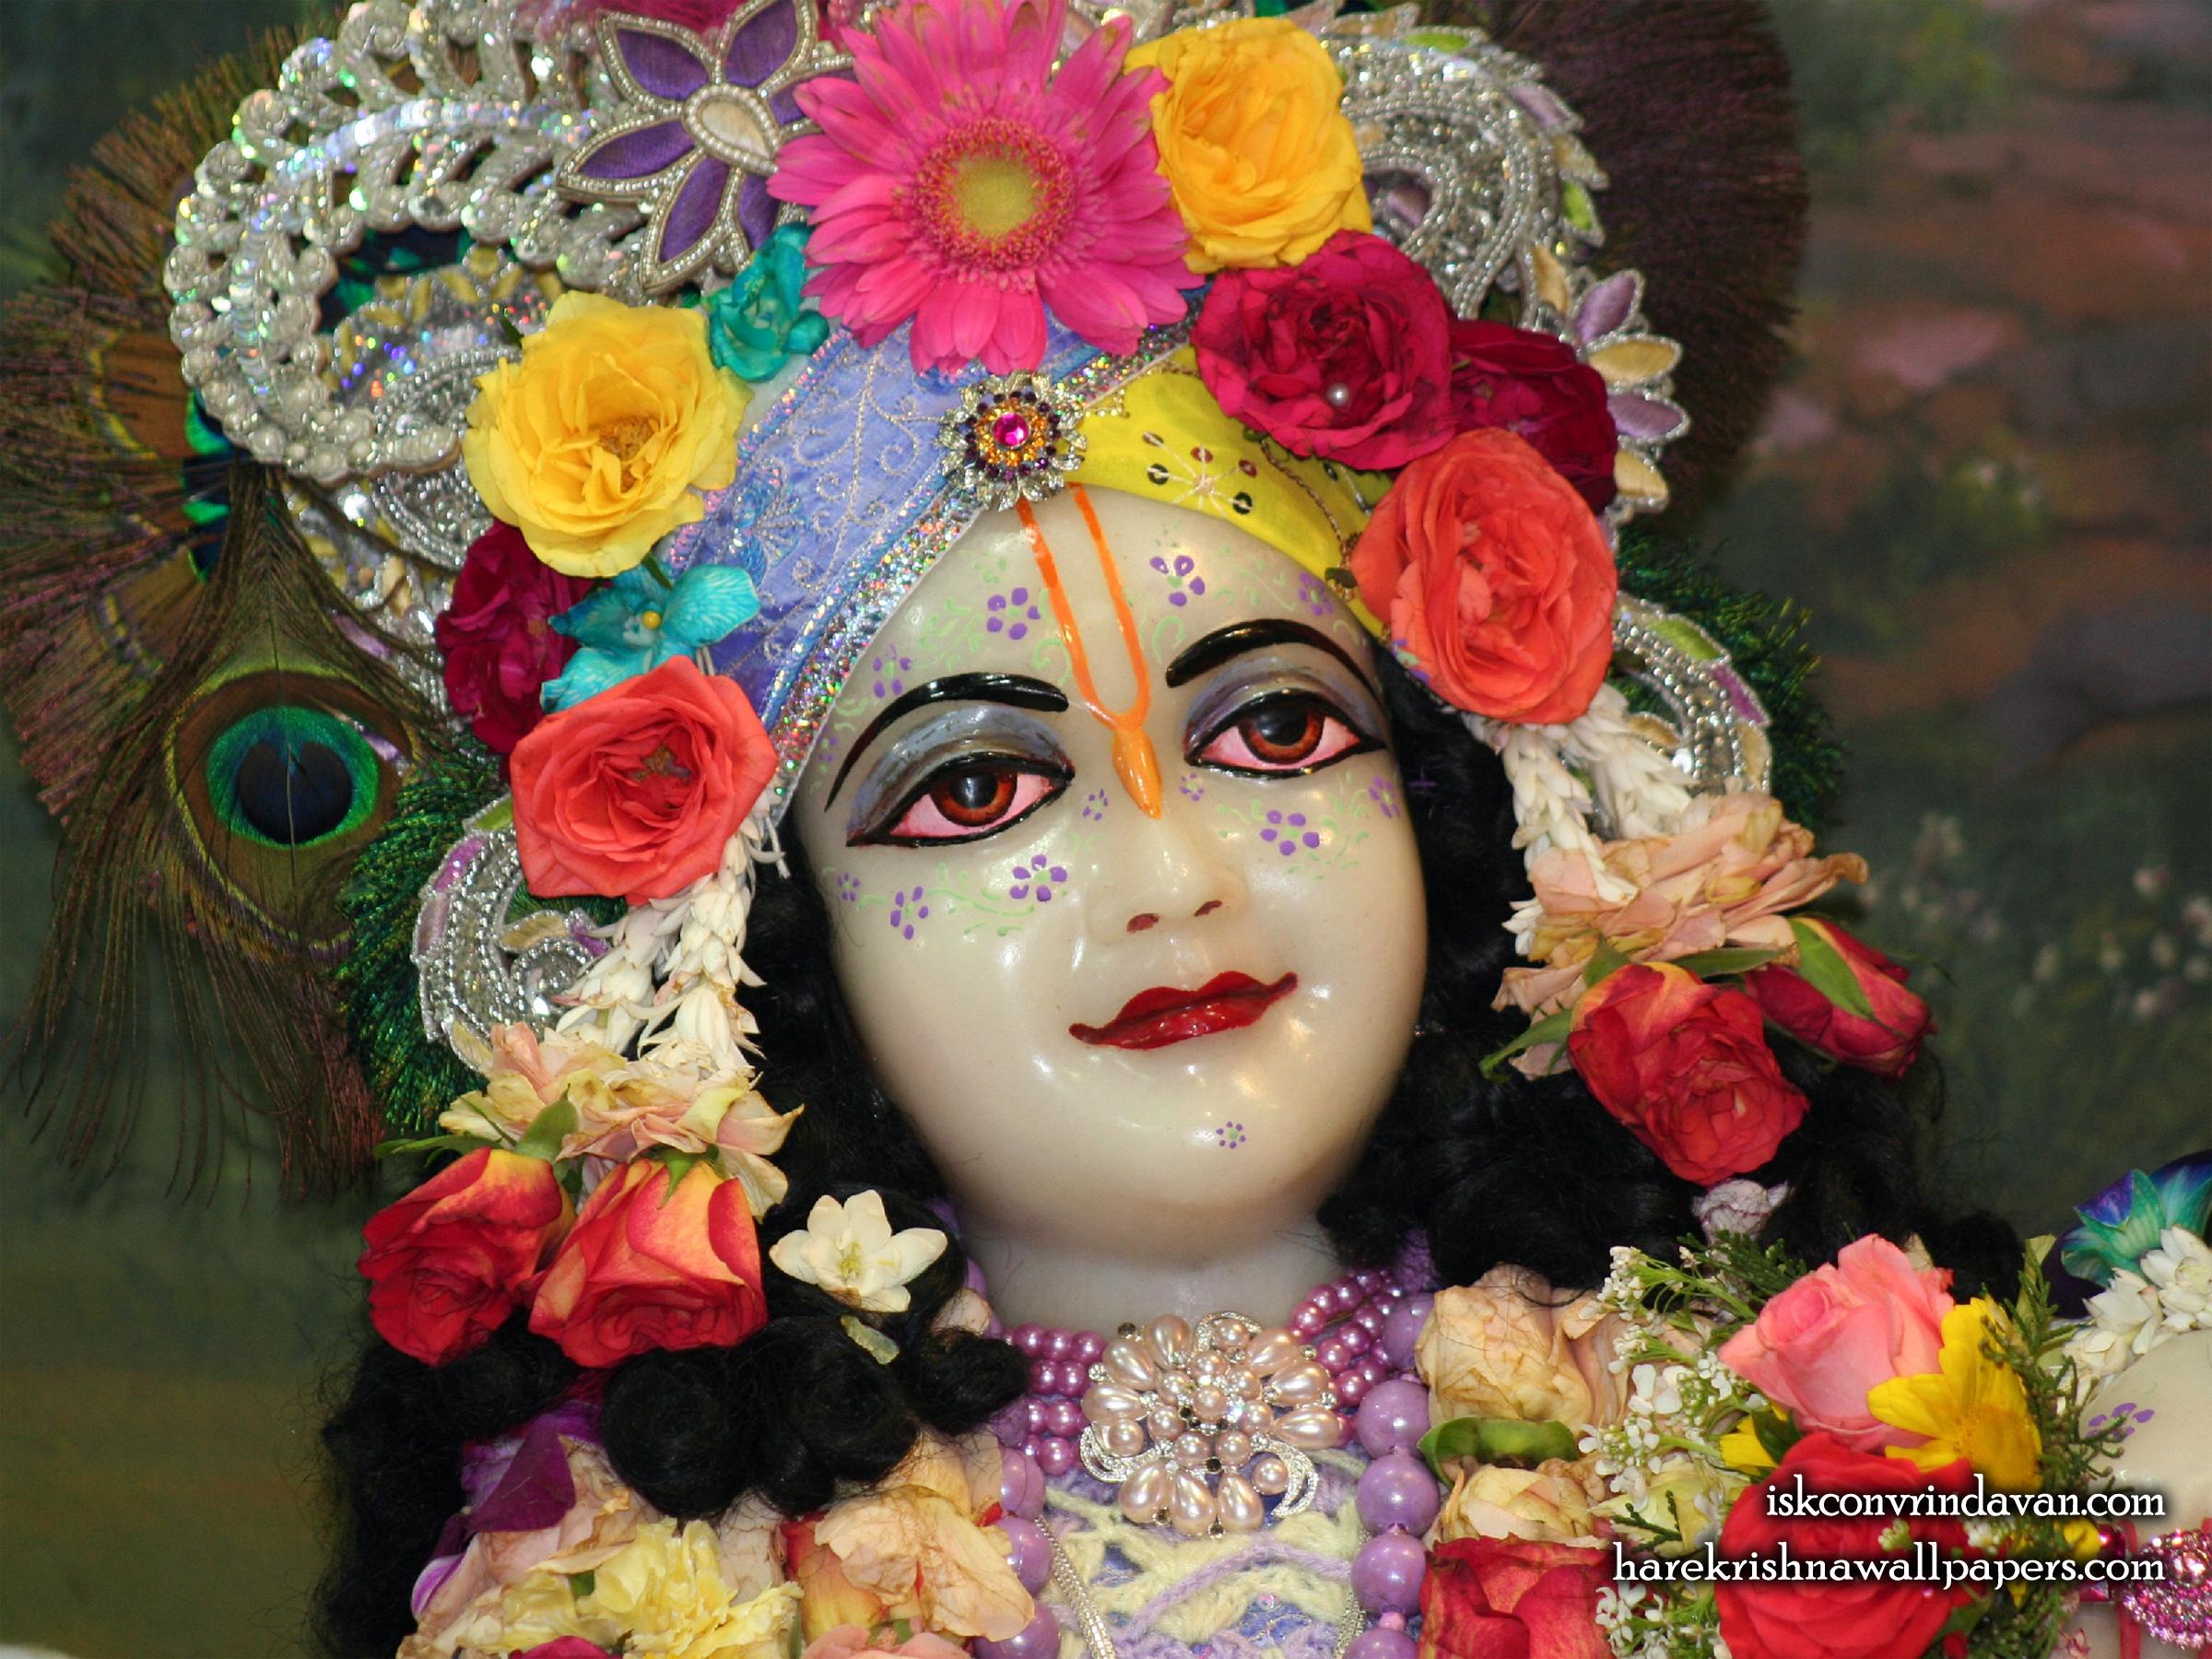 Sri Balaram Close up Wallpaper (008) Size 2400x1800 Download